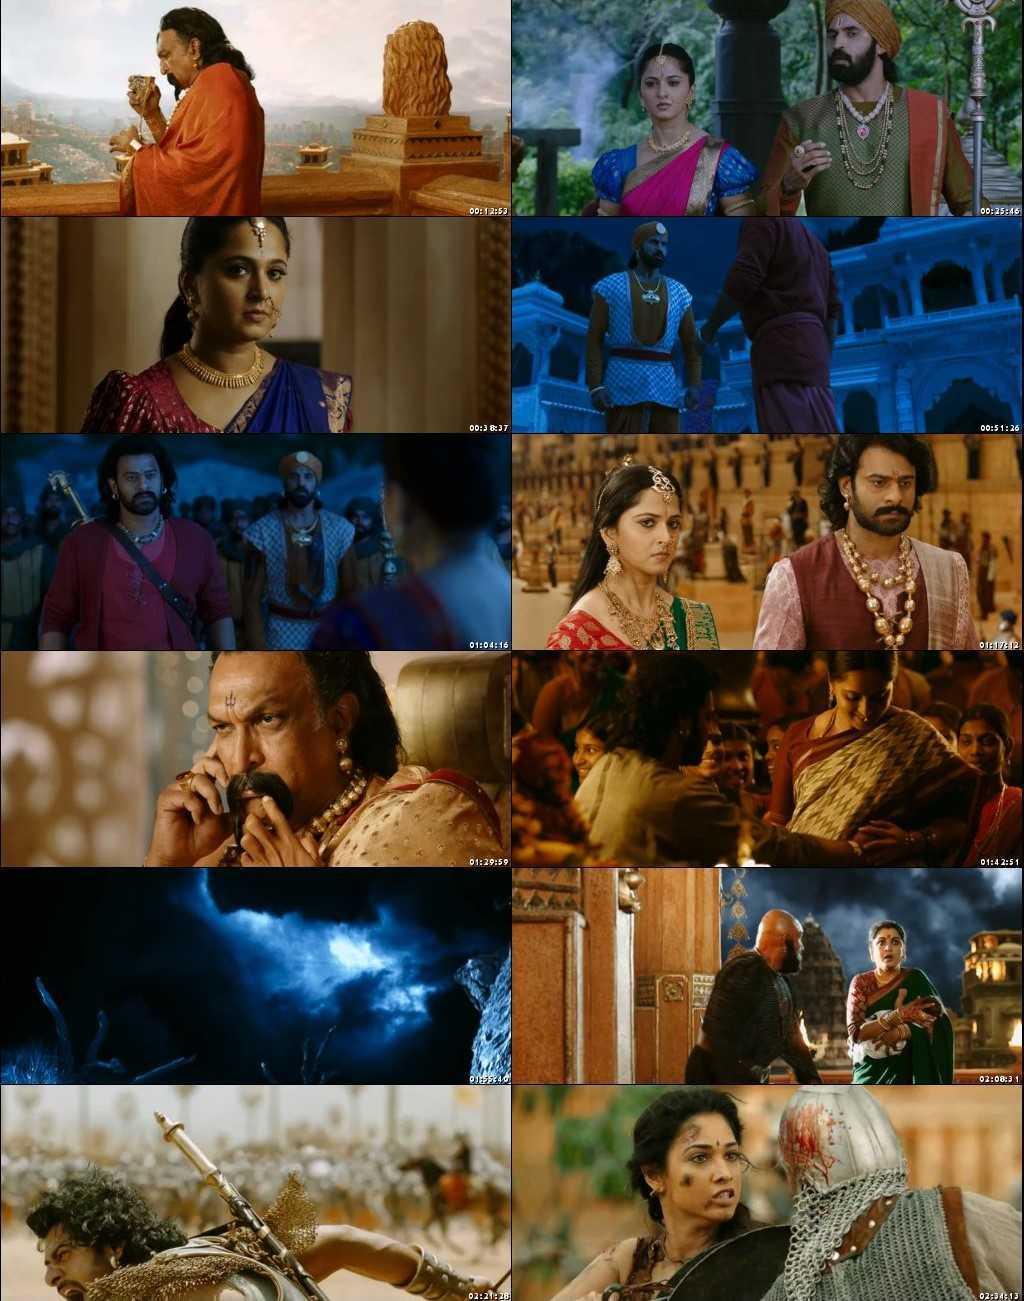 Bahubali 2: The Conclusion 2017 Screenshot 1080p